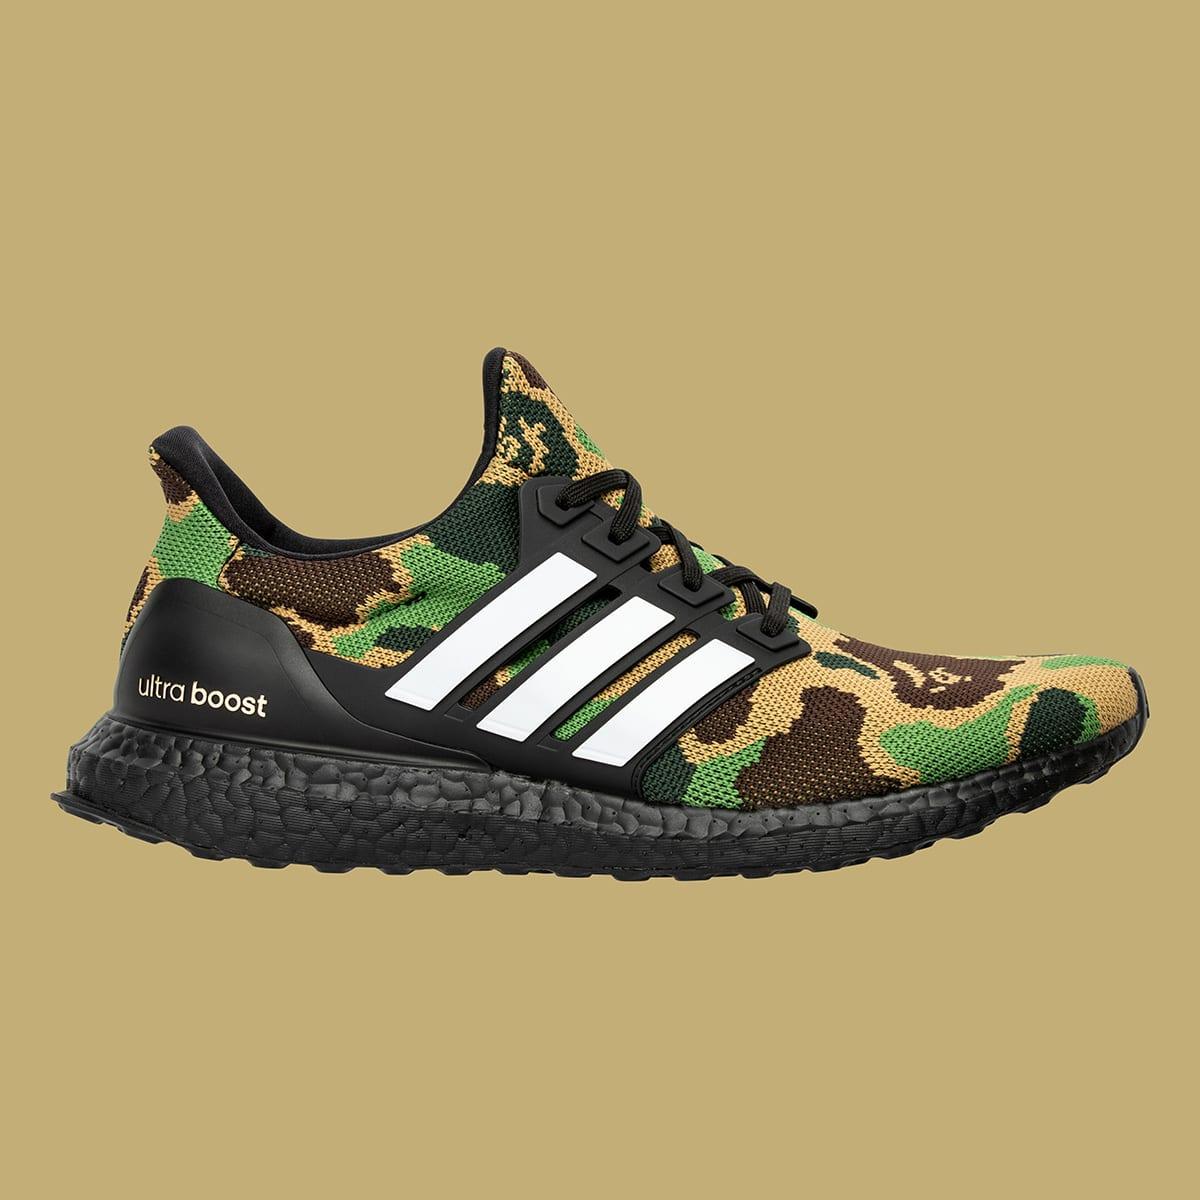 separation shoes f5f6e 34536 Adidas x BAPE Ultra Boost (Green Camo)